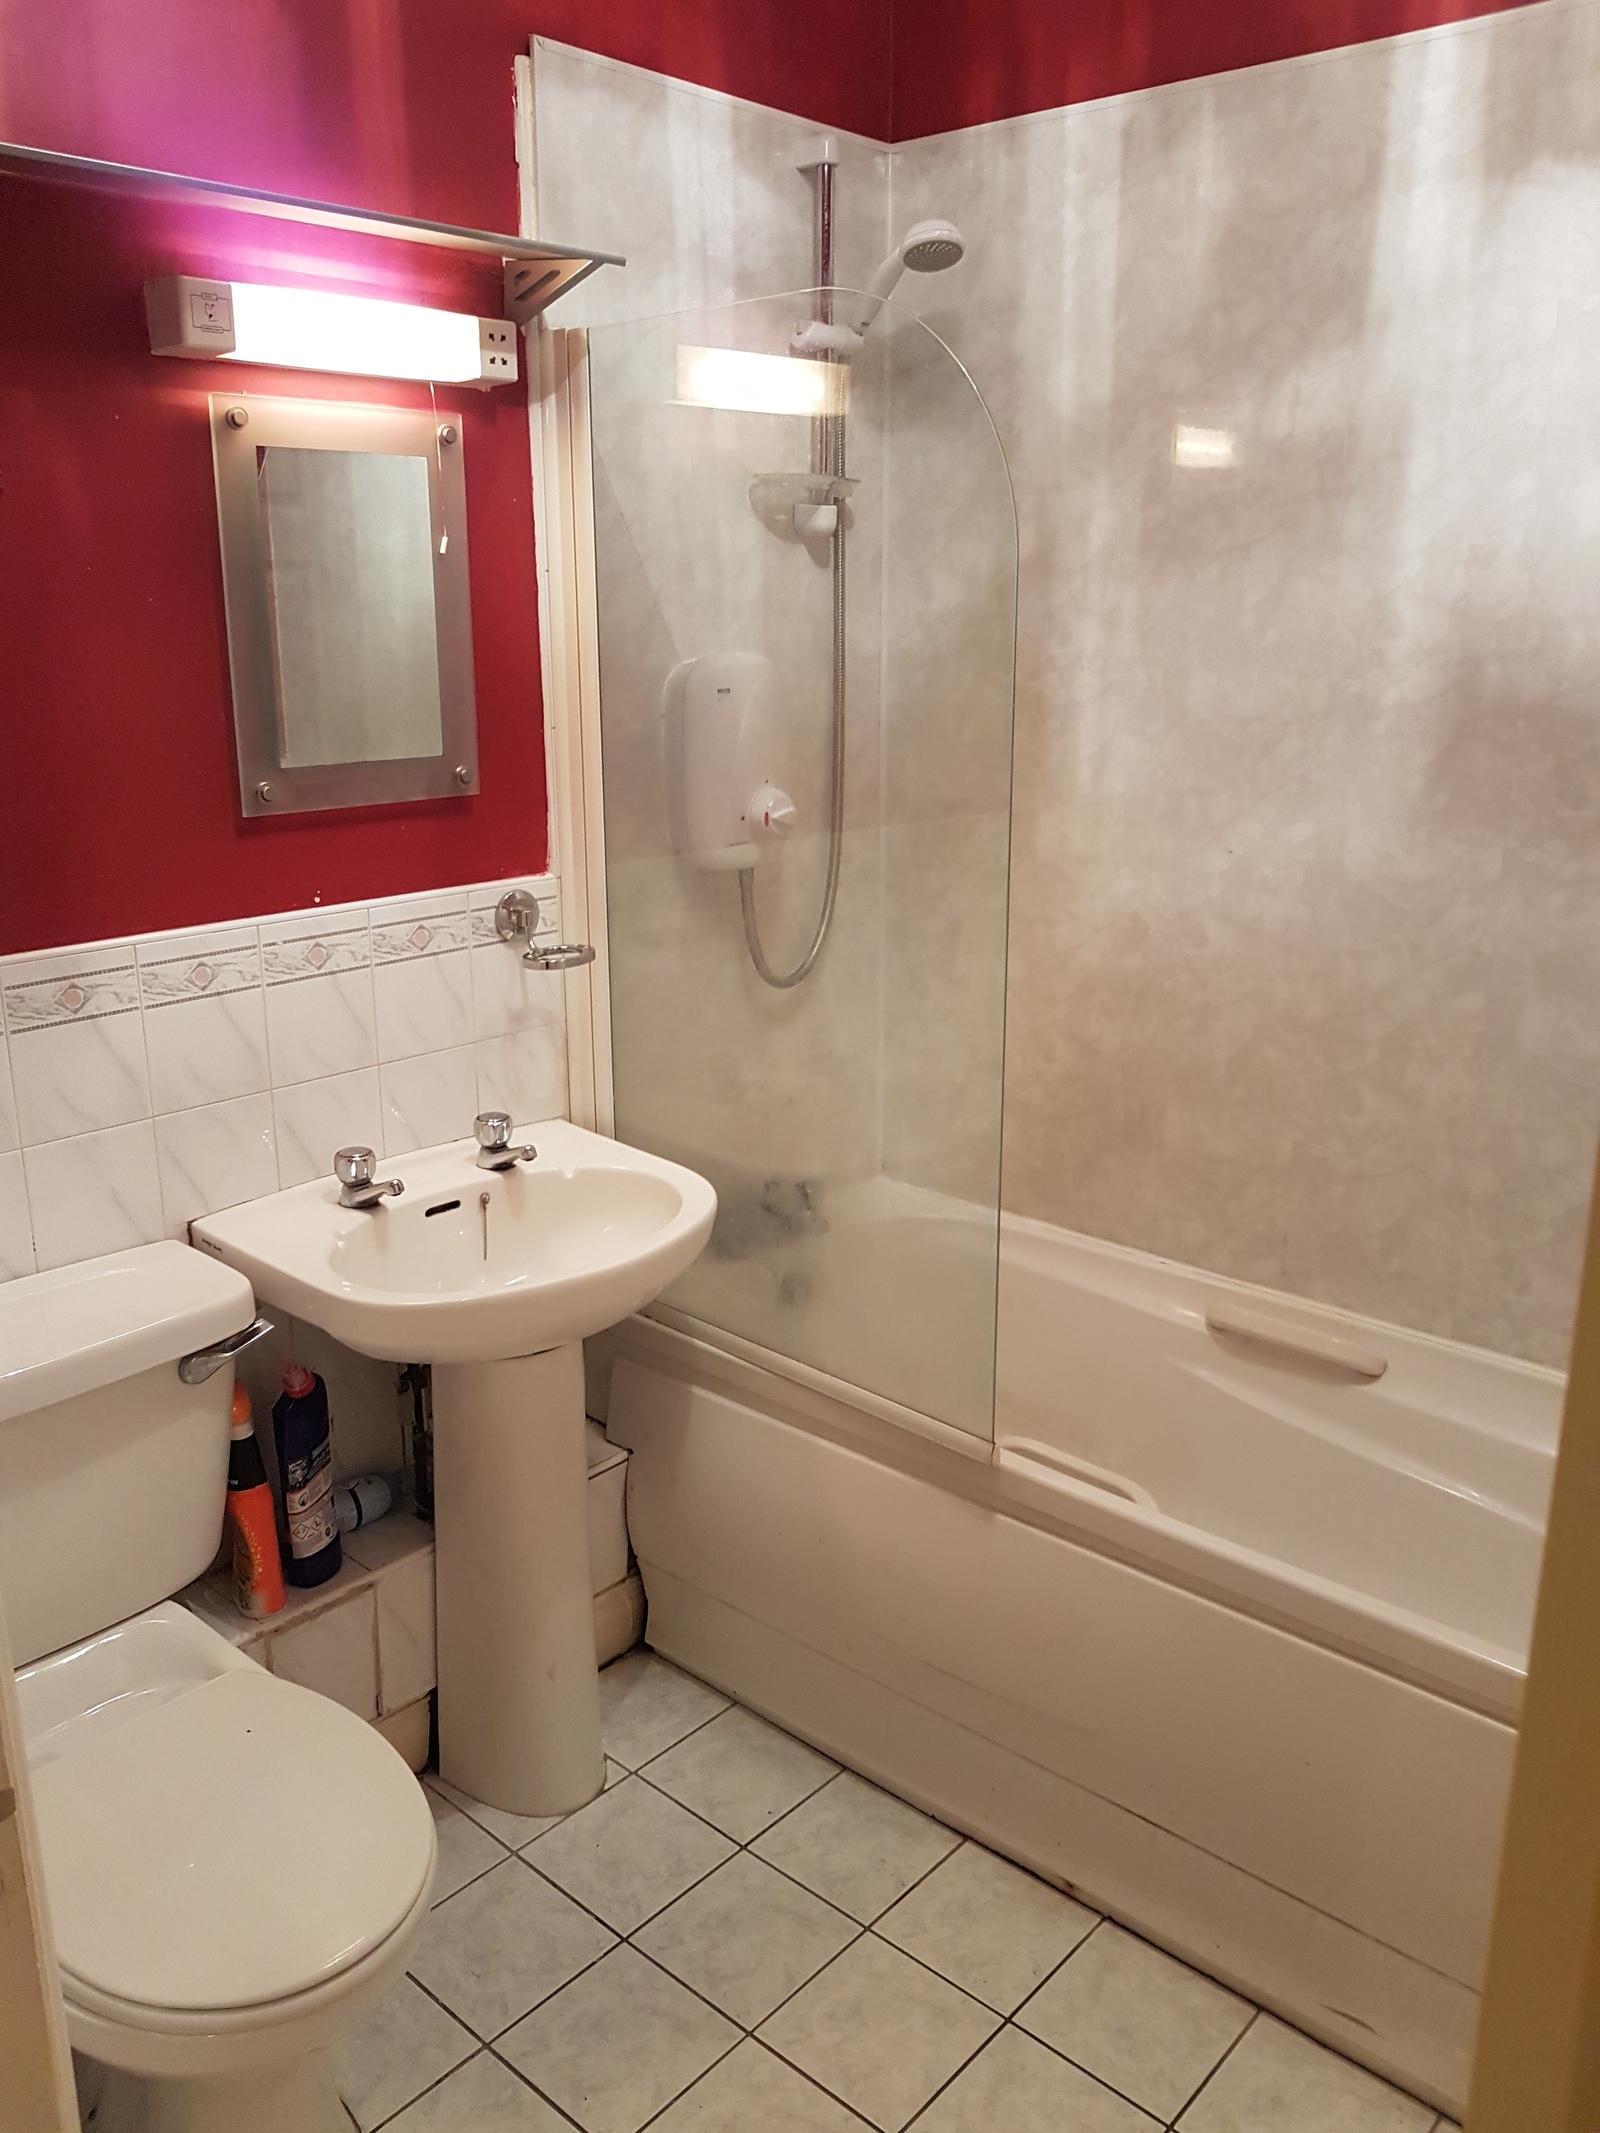 Apartment 74, Greenville Place, Dublin 8